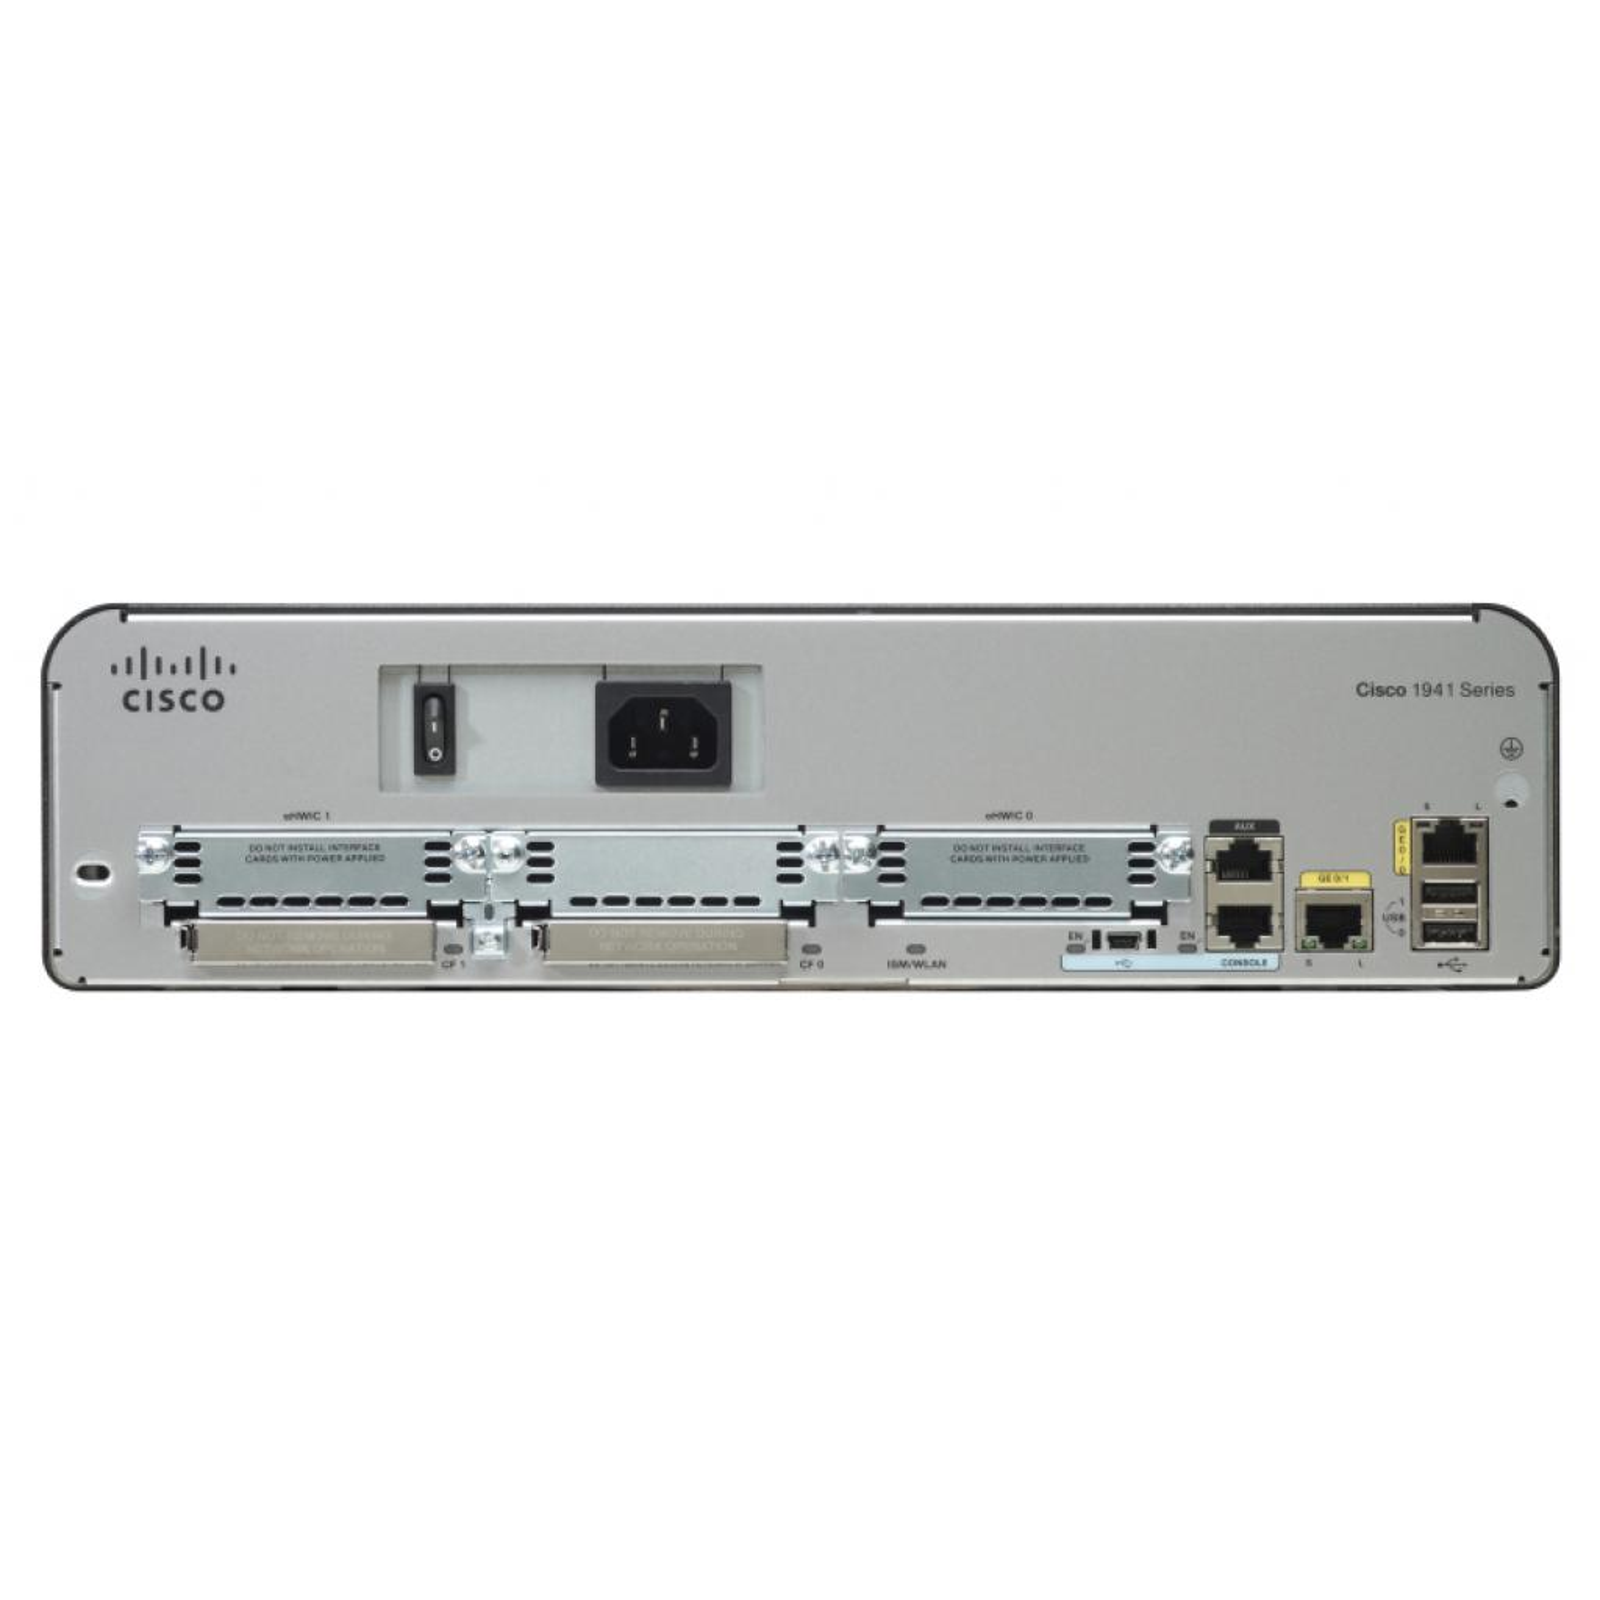 Маршрутизатор Cisco CISCO1941-SEC/K9 изображение 2